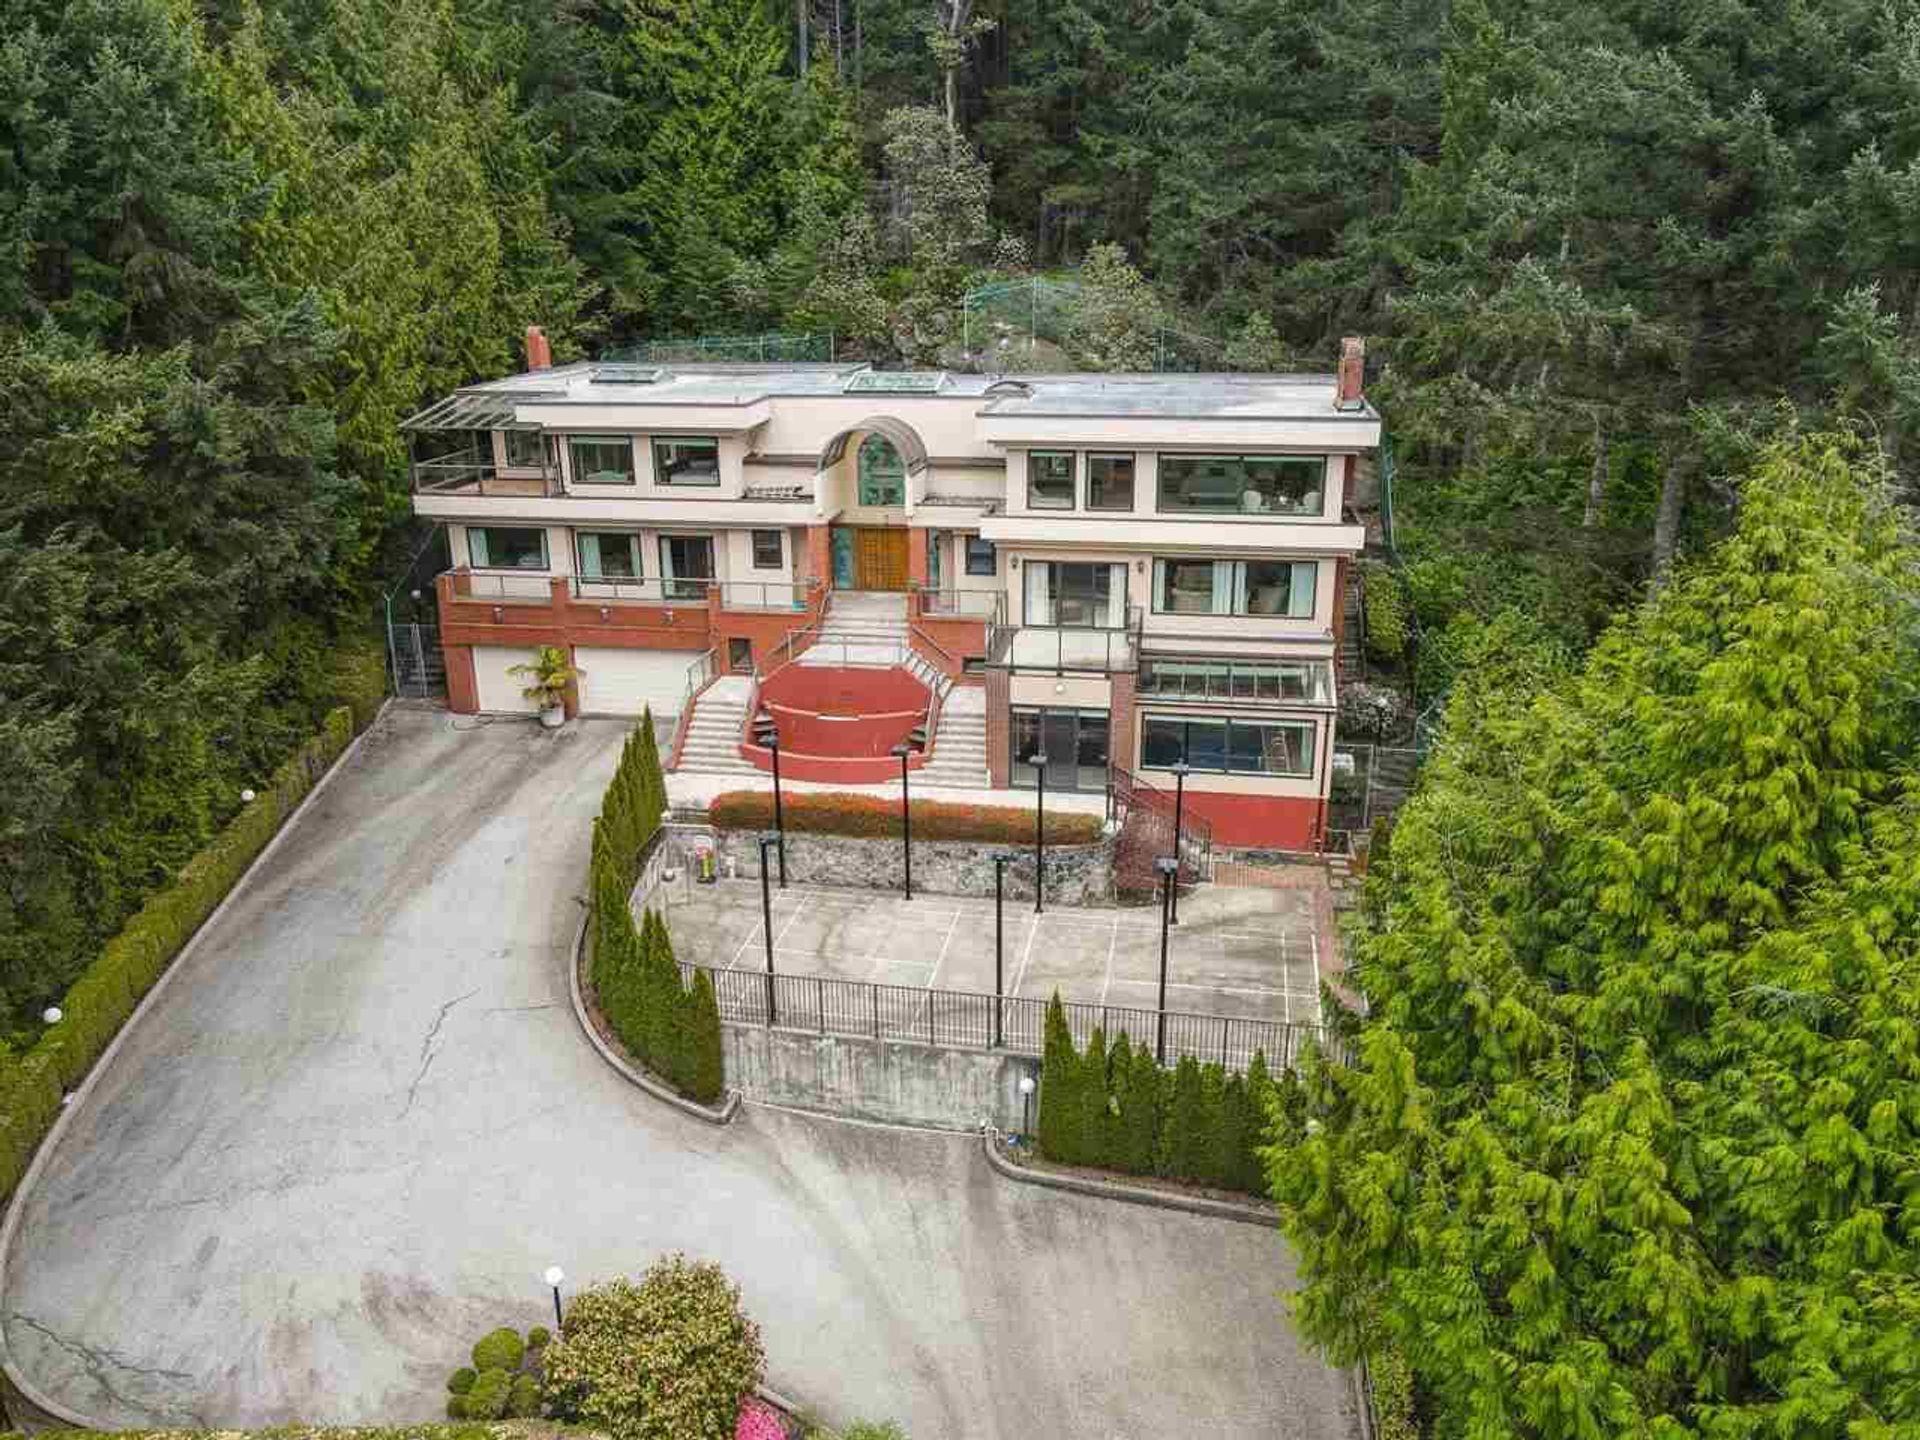 4556-woodgreen-drive-cypress-park-estates-west-vancouver-30 at 4556 Woodgreen Drive, Cypress Park Estates, West Vancouver